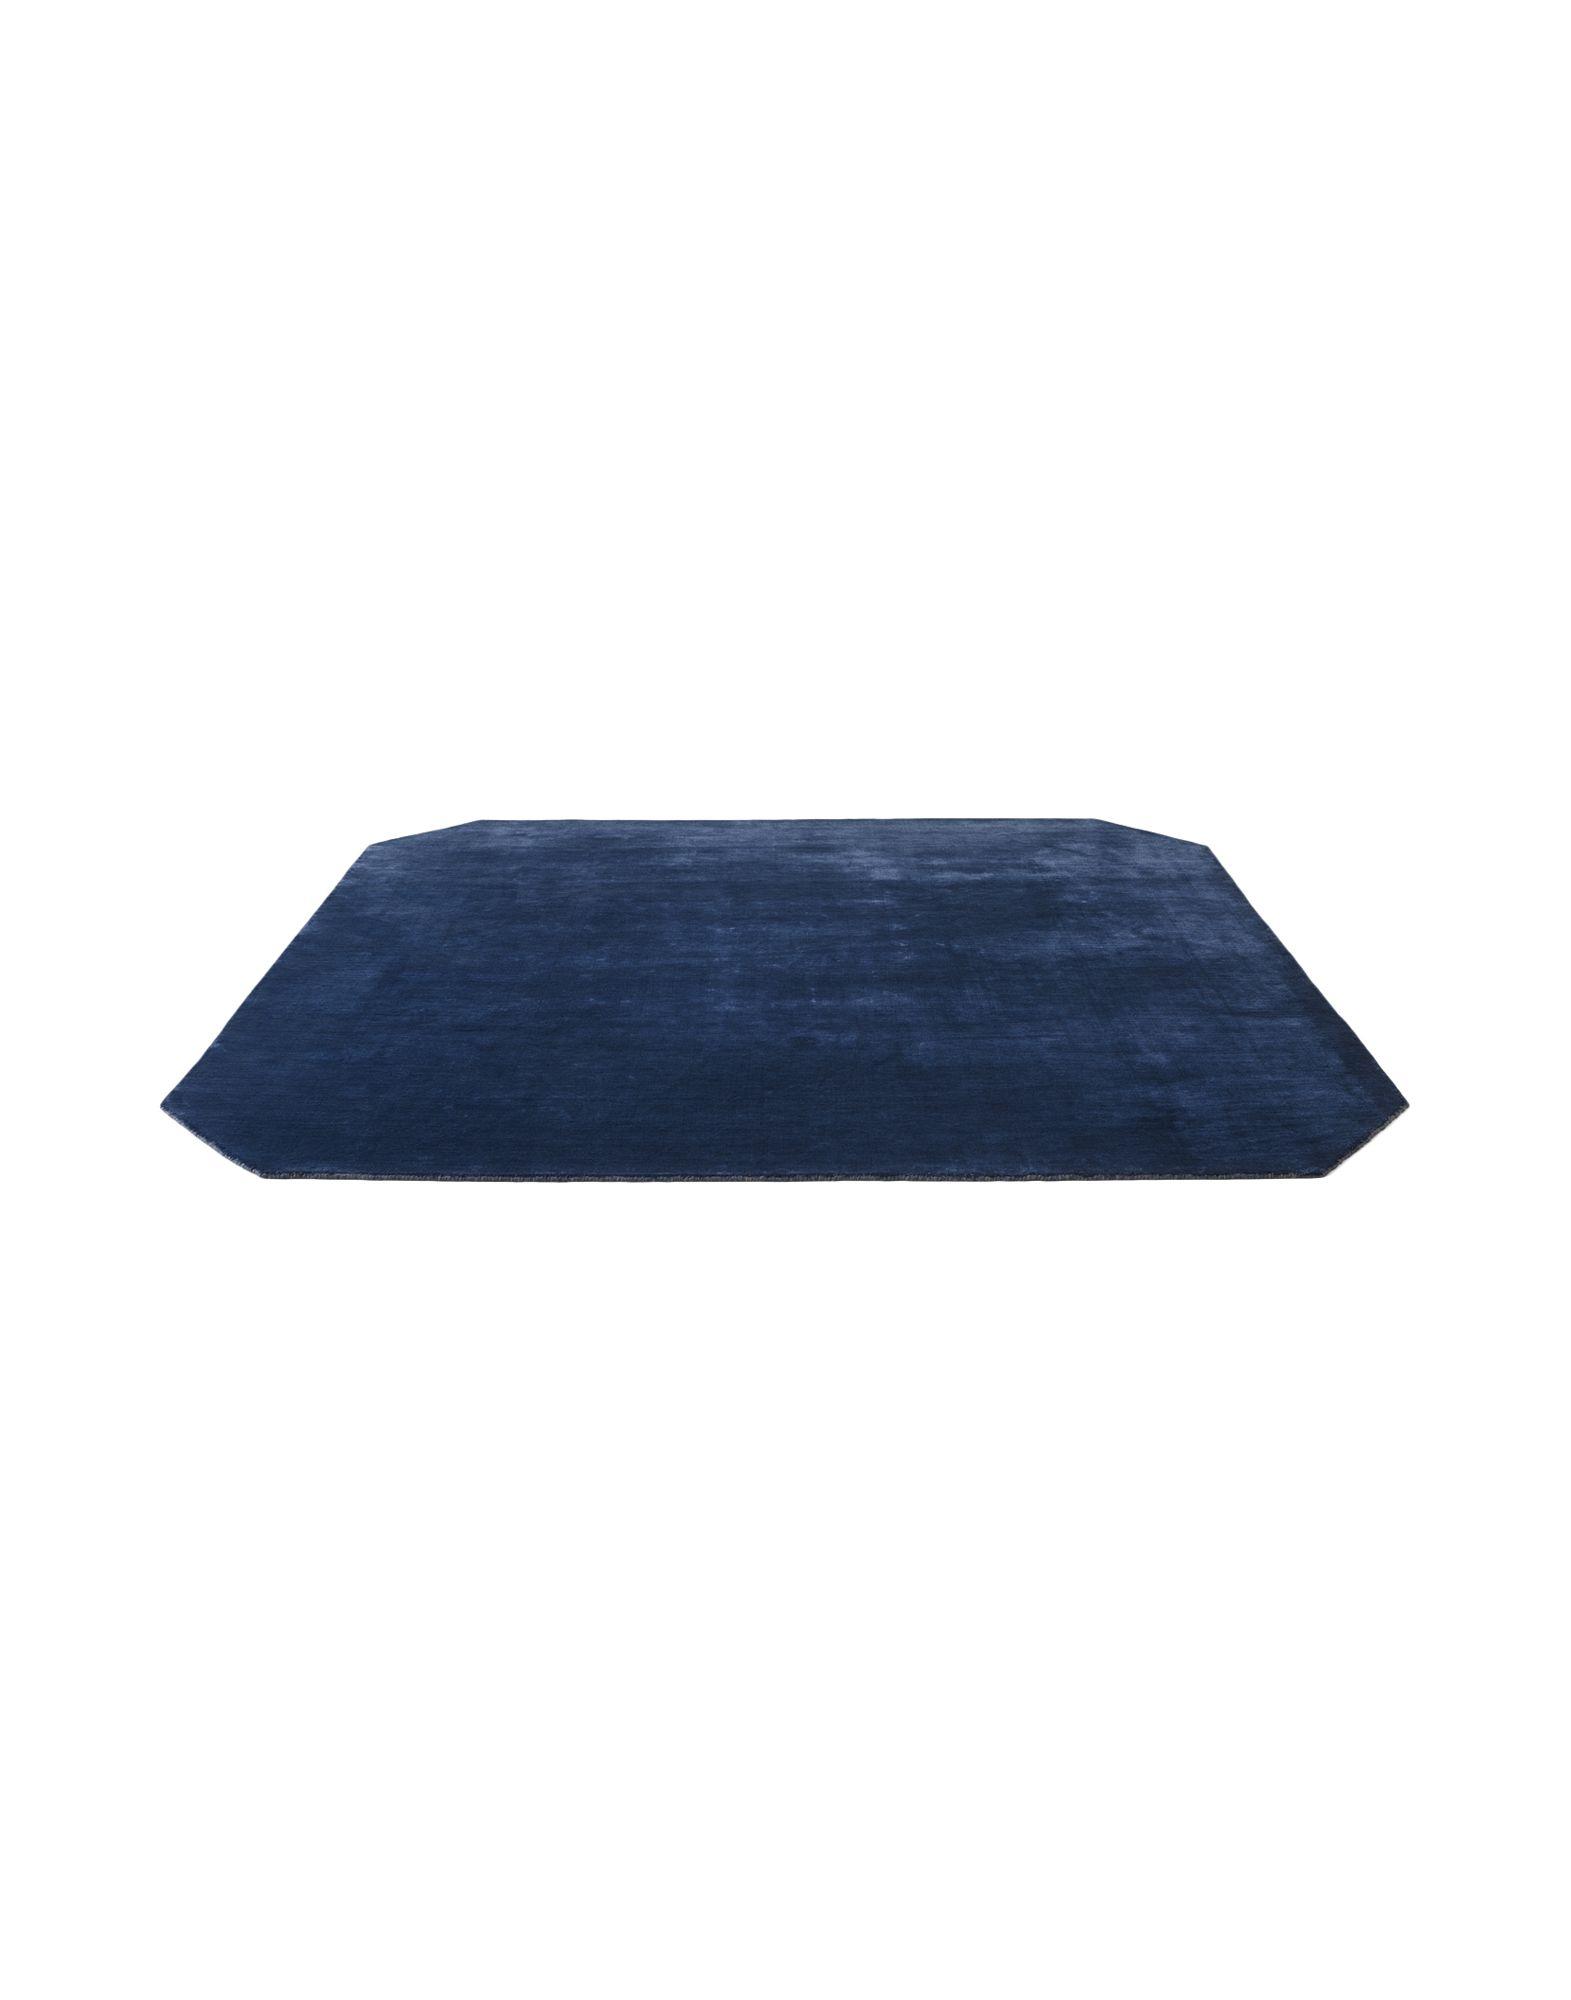 &TRADITION Unisex Teppich Farbe Blau Größe 1